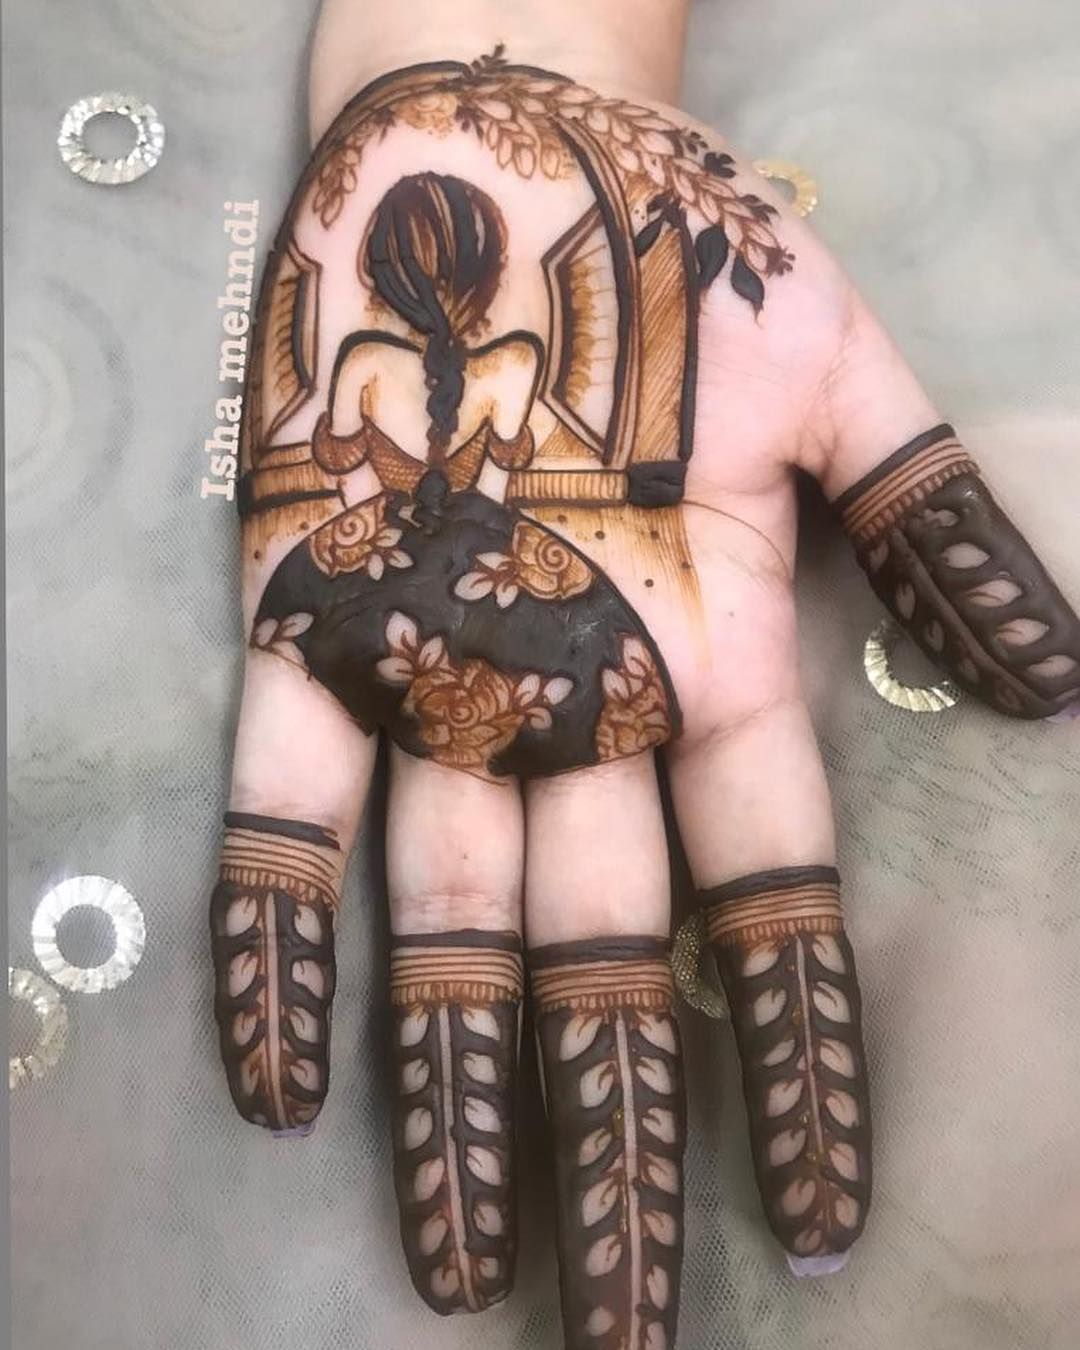 Brides essentials on instagram  clook at these beautiful intricate mehendi designs from heena byisha aren   they also nyc mehndi design rh pinterest